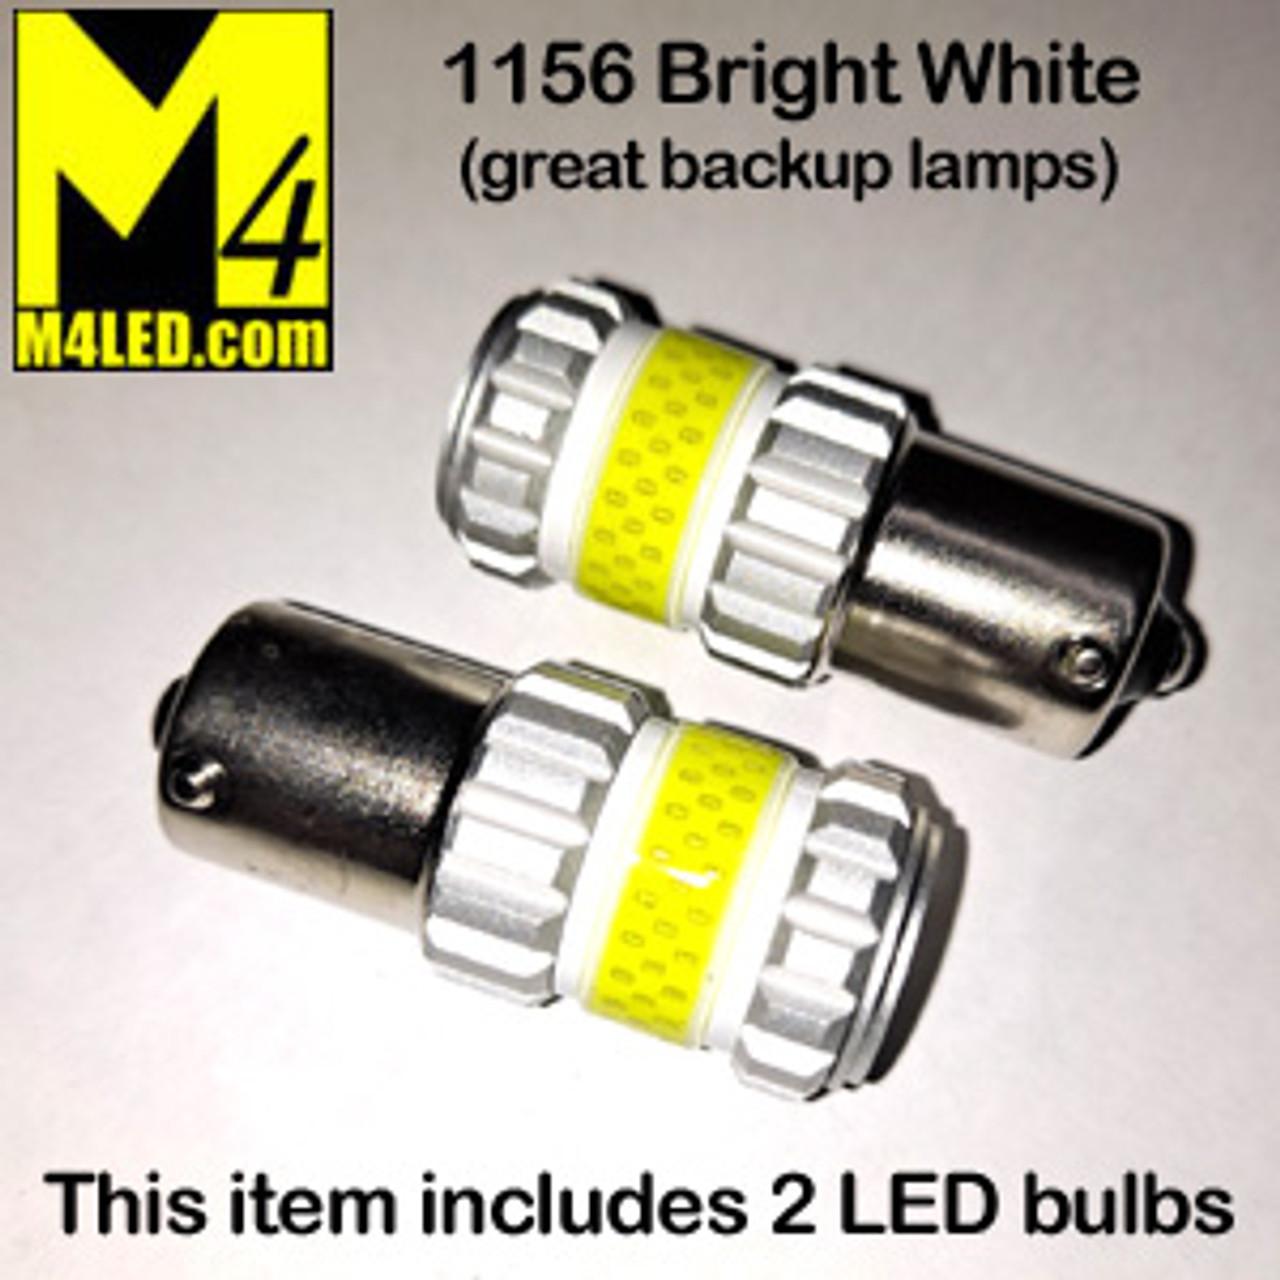 1156-G12-WHITE PAIR 1156 Brake and Tail Light (Backup)